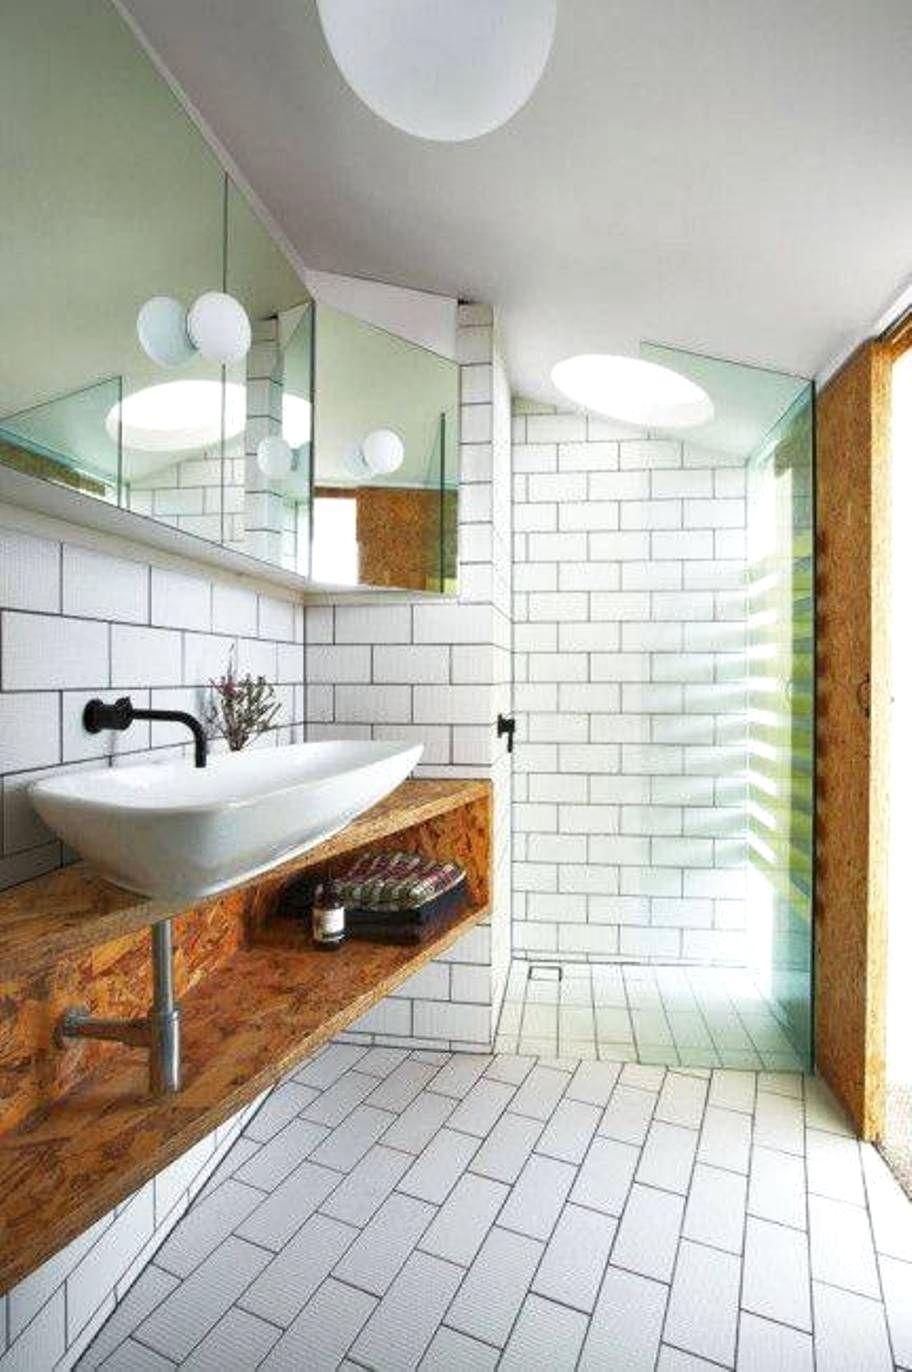 29 Beautiful Bathroom Lighting Fixture Ideas To Accent Your Bathroom ...